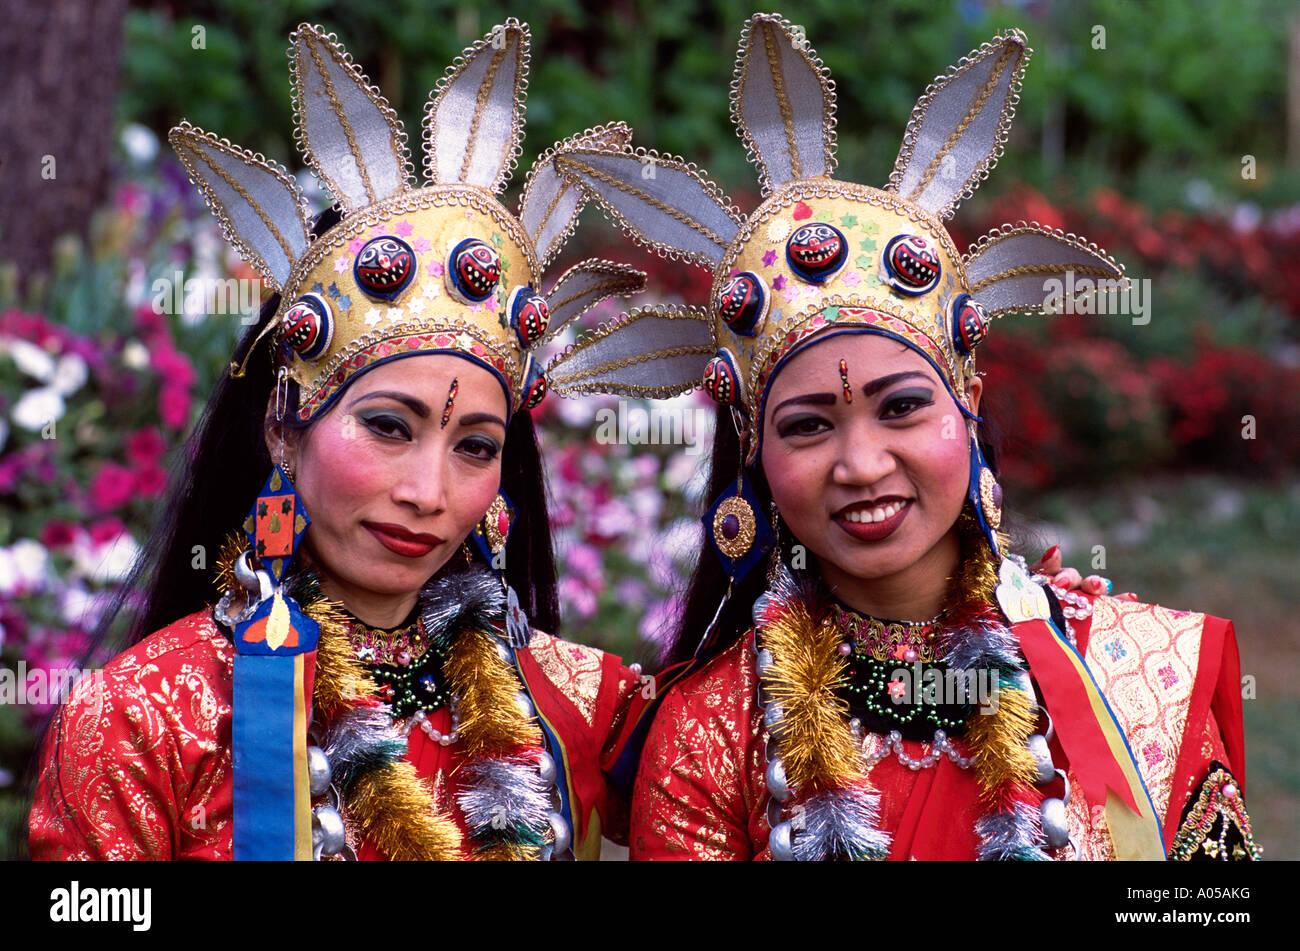 Kathmandu, Women, Traditional Dancers - Stock Image